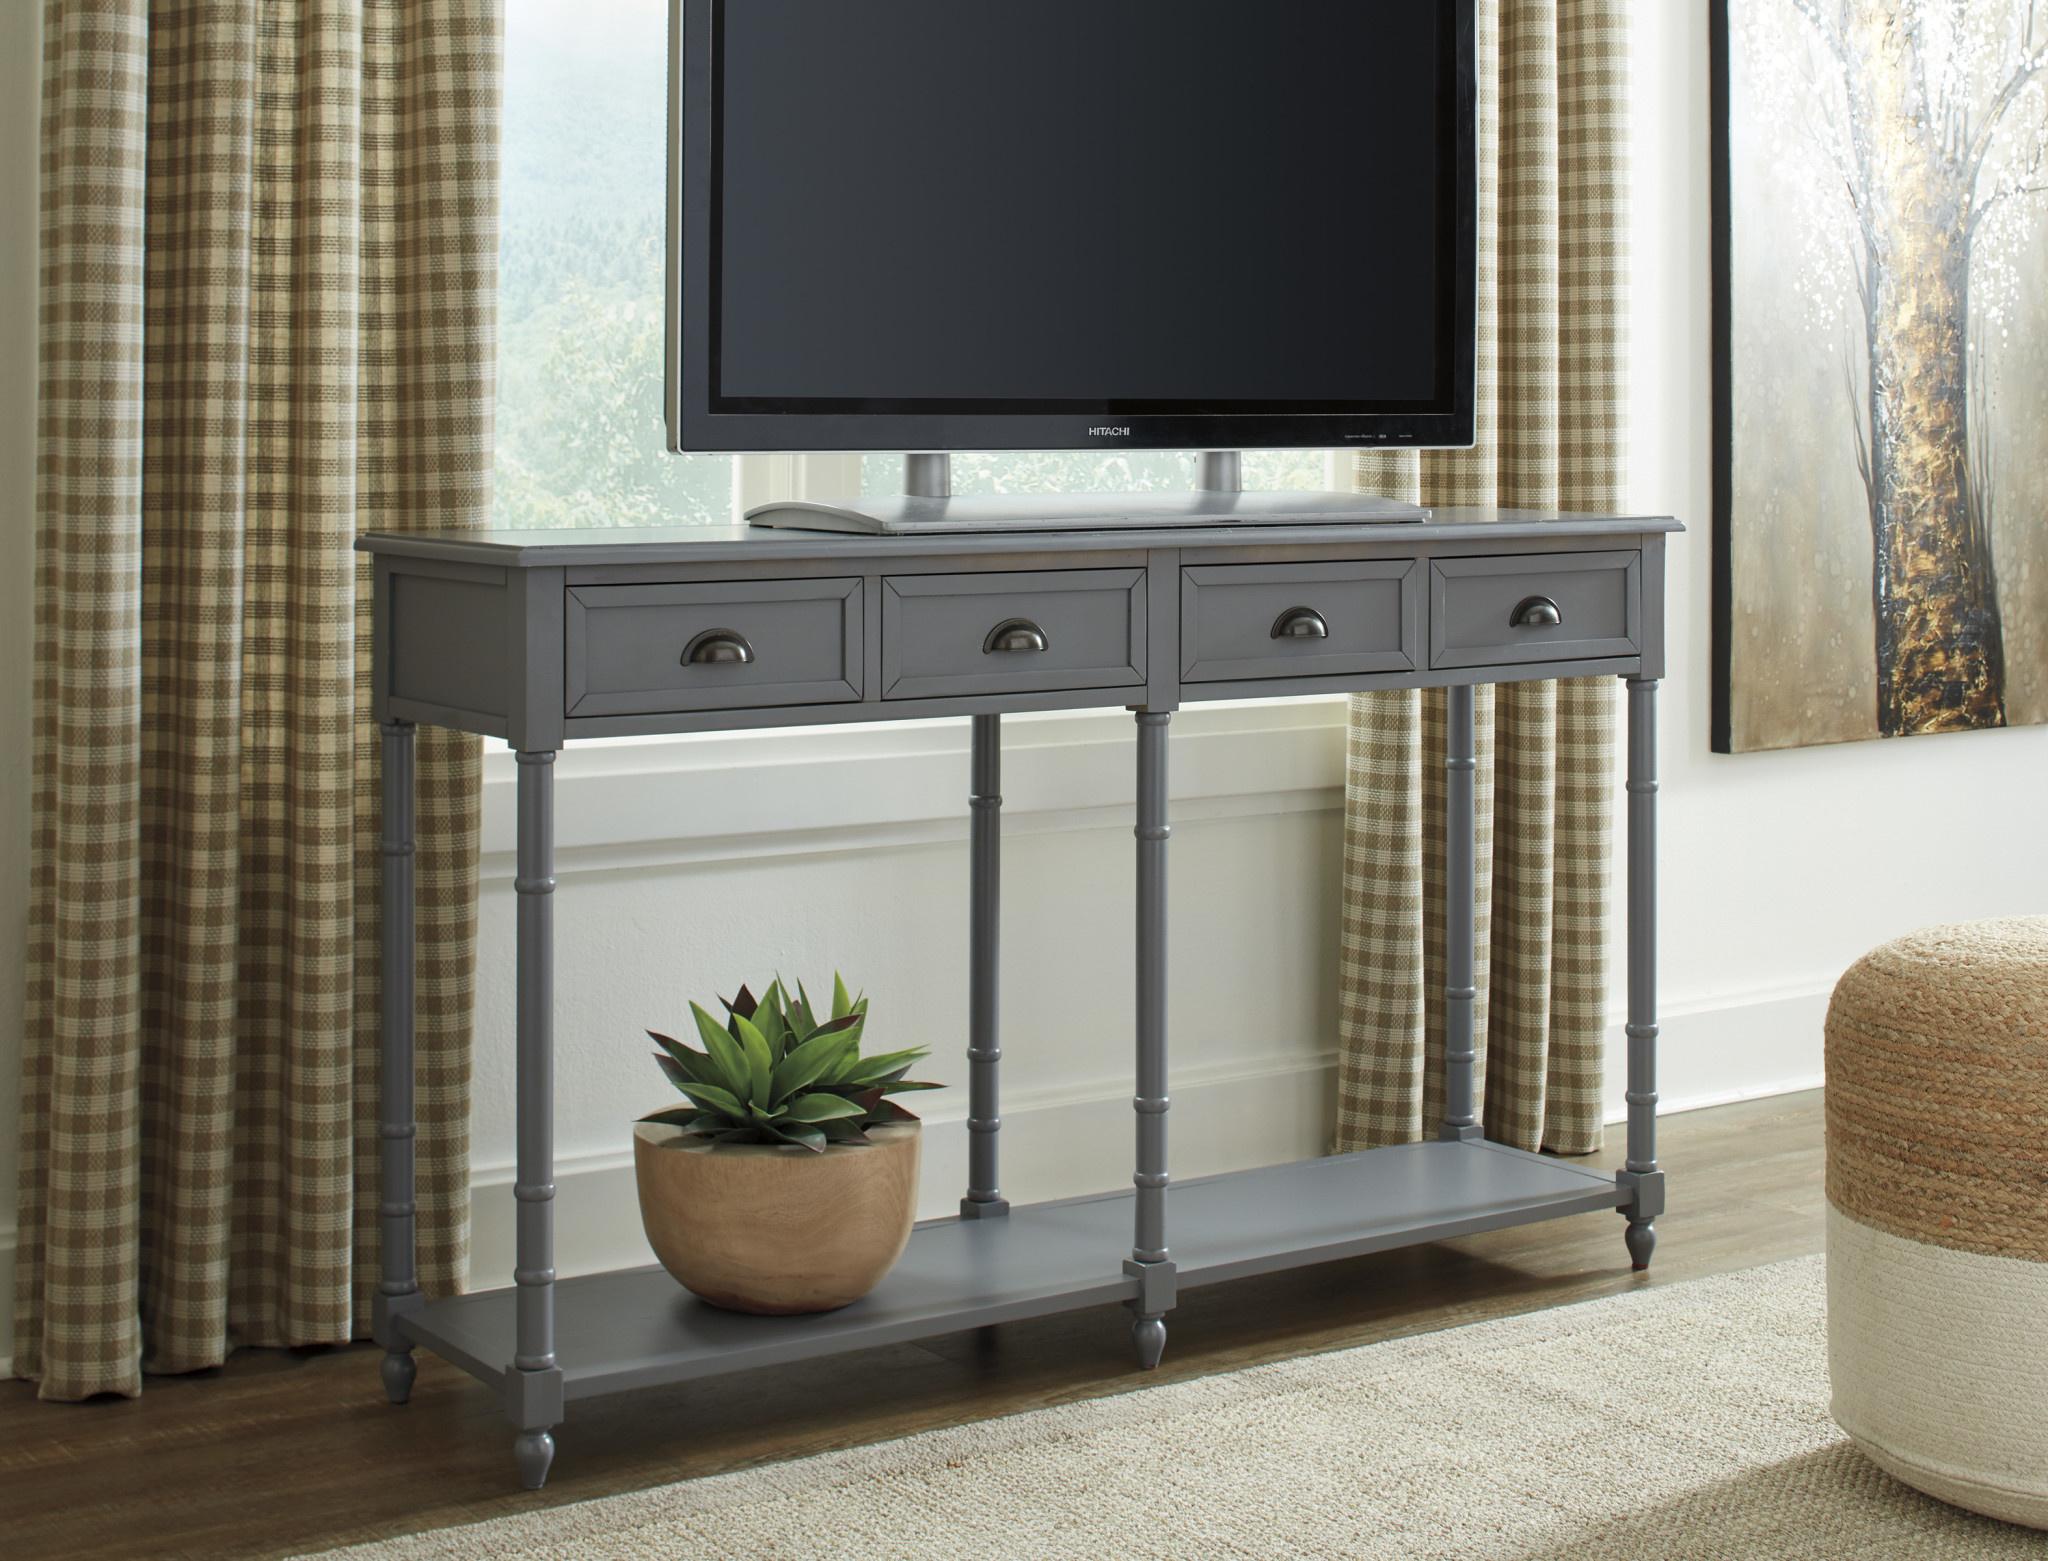 Signature Design Eirdale Console Sofa Table- Gray A4000188